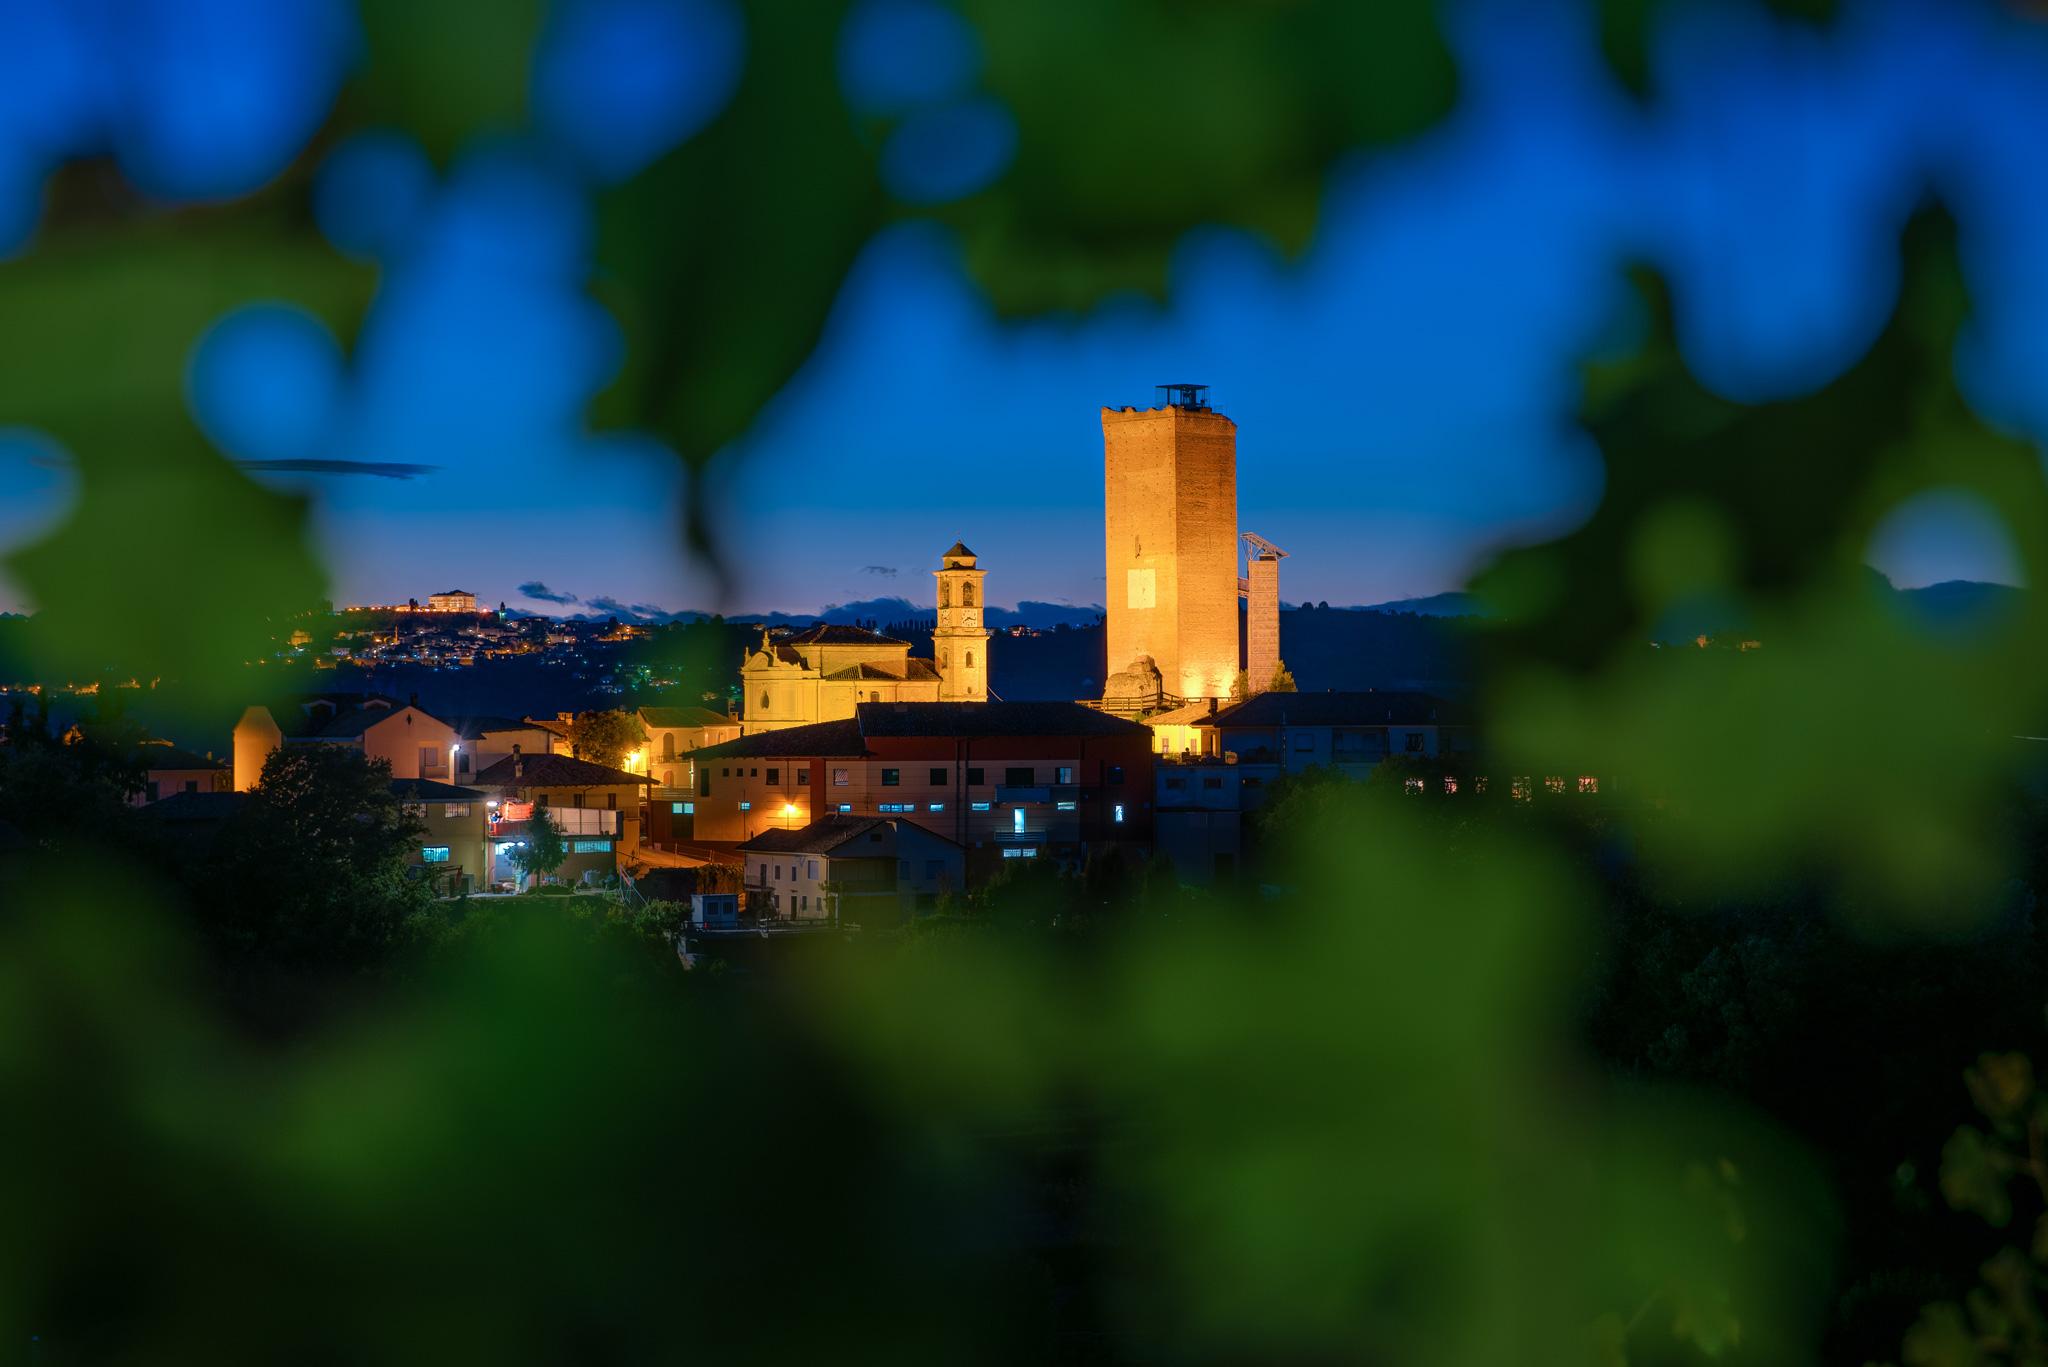 Paesaggi-Italia - Emanuele Tibaldi Fotografo Barbaresco2 - Fotografo di paesaggi-Barbaresco Torre paesaggio notturno nelle langhe - Fotografo di paesaggi-Barbaresco Torre paesaggio notturno nelle langhe